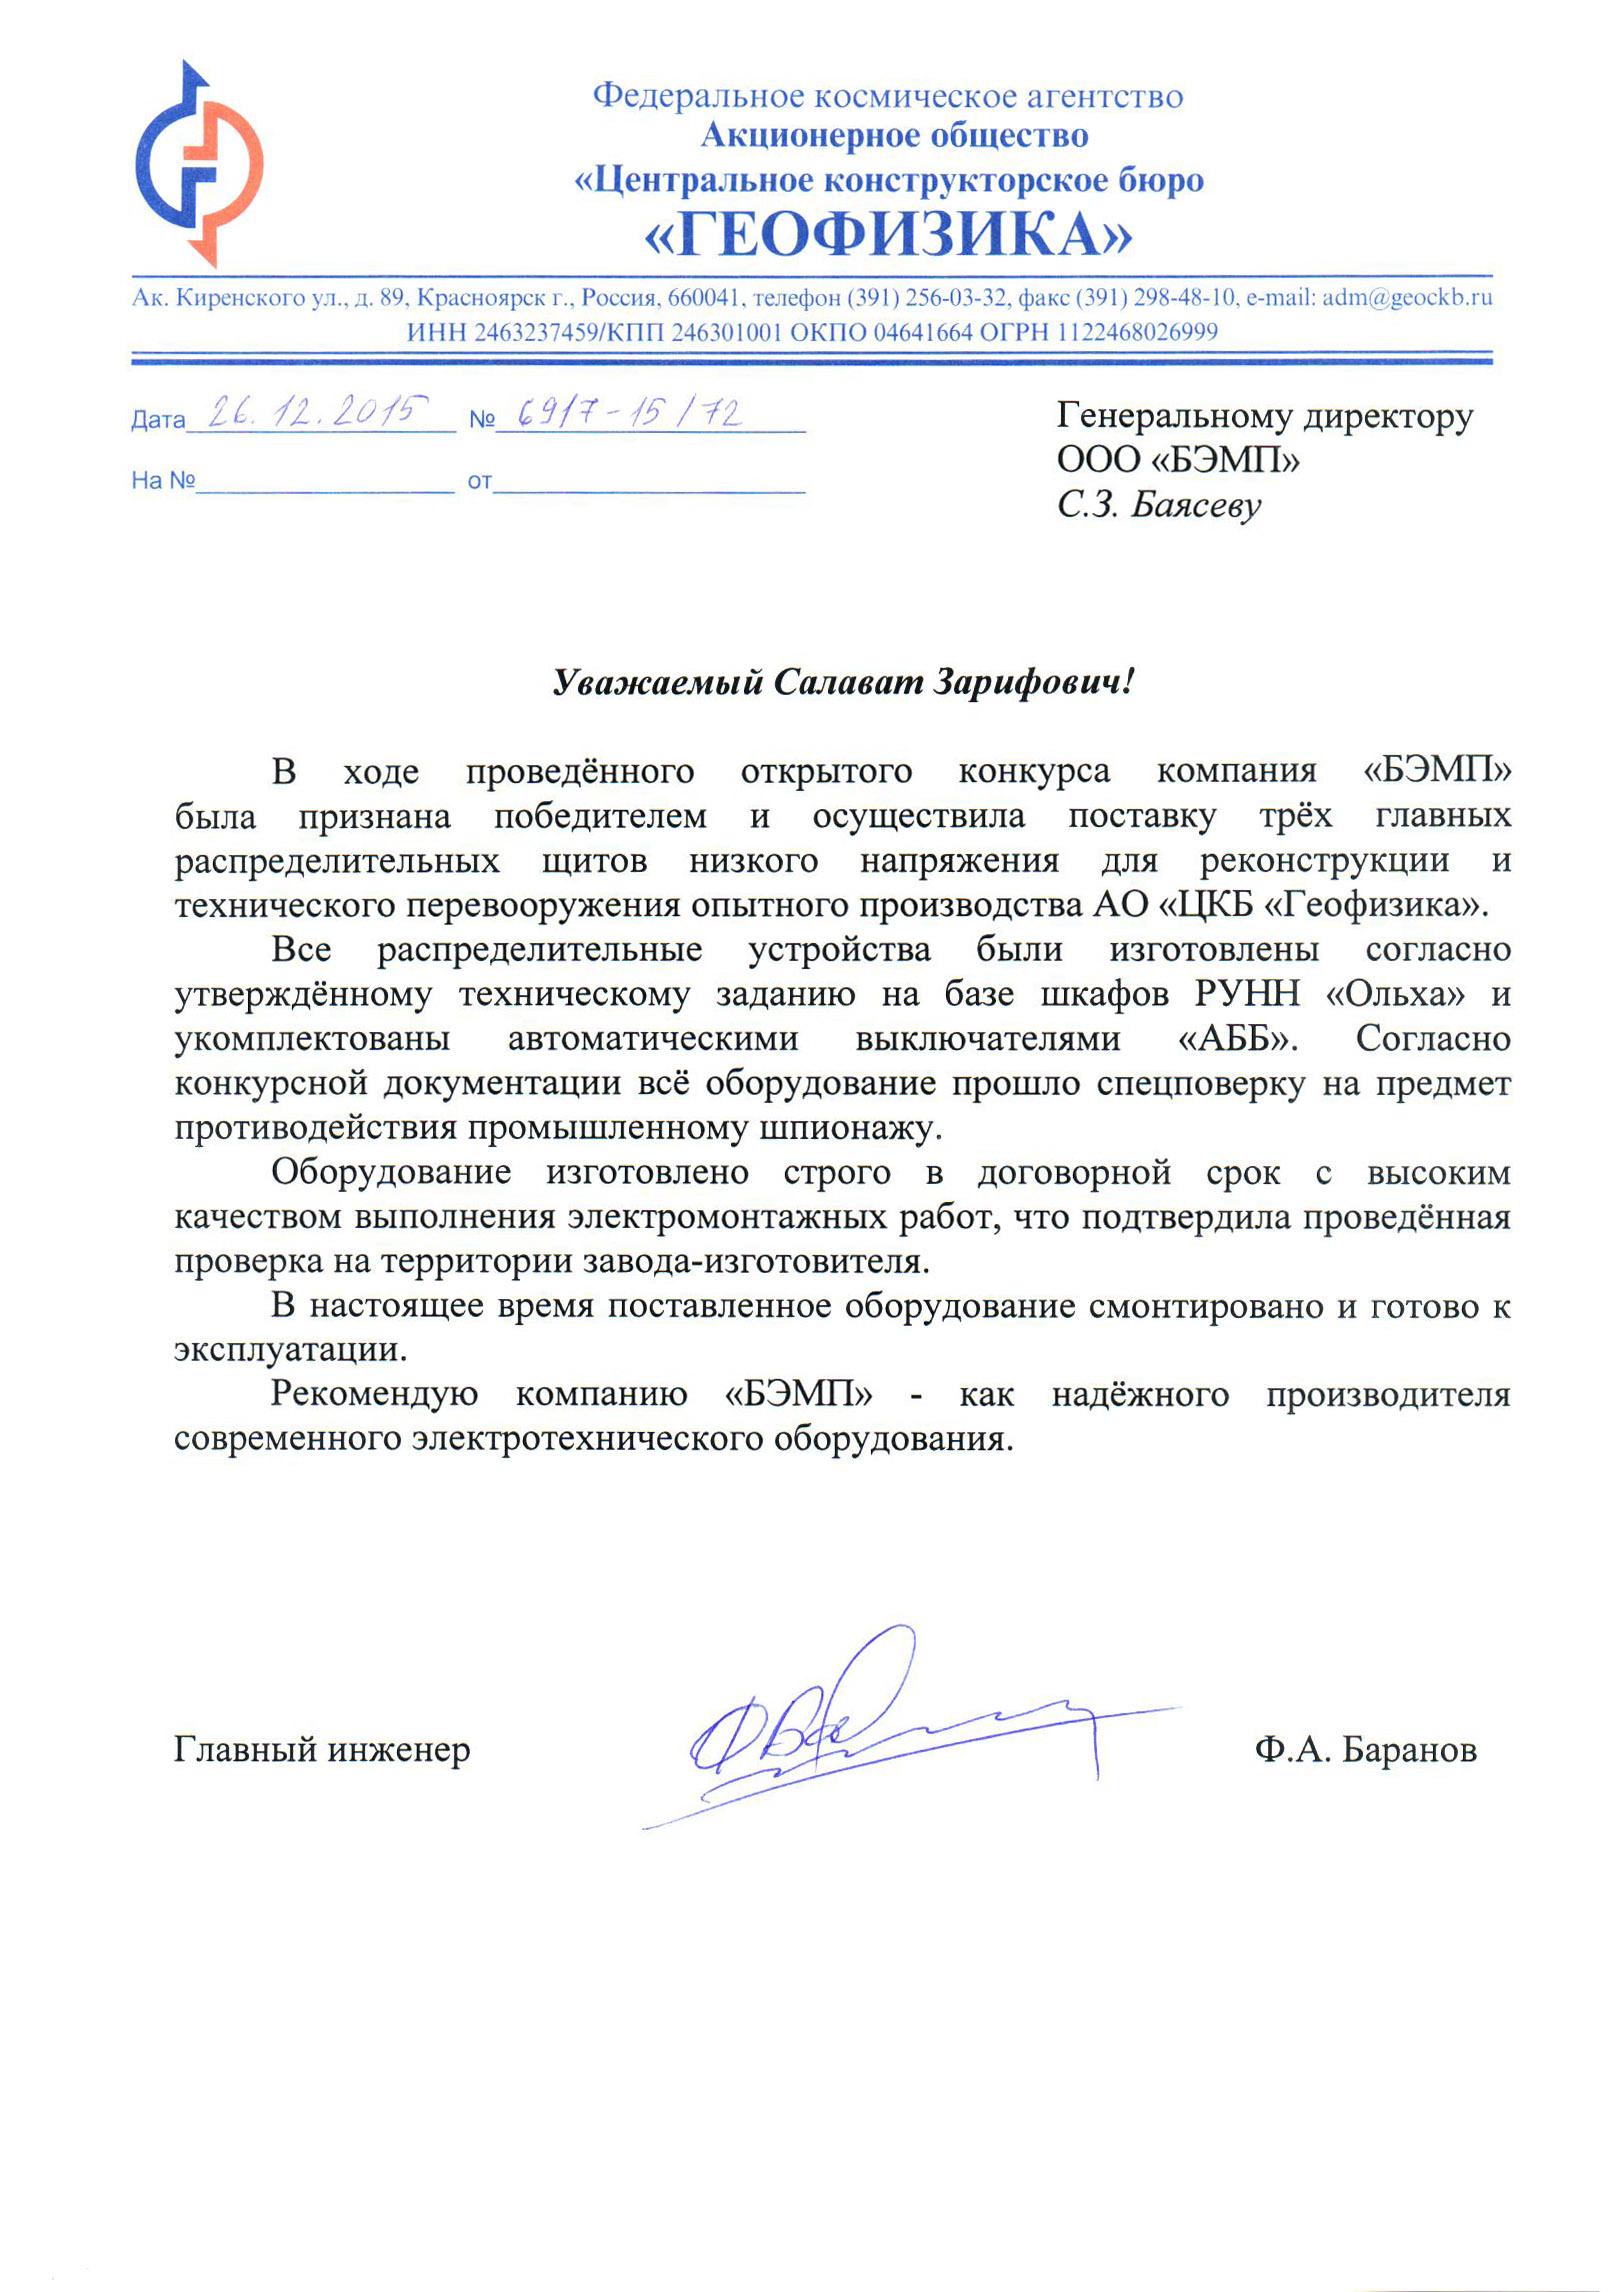 АО «ЦКБ «ГЕОФИЗИКА» (г. Красноярск) 234_file2